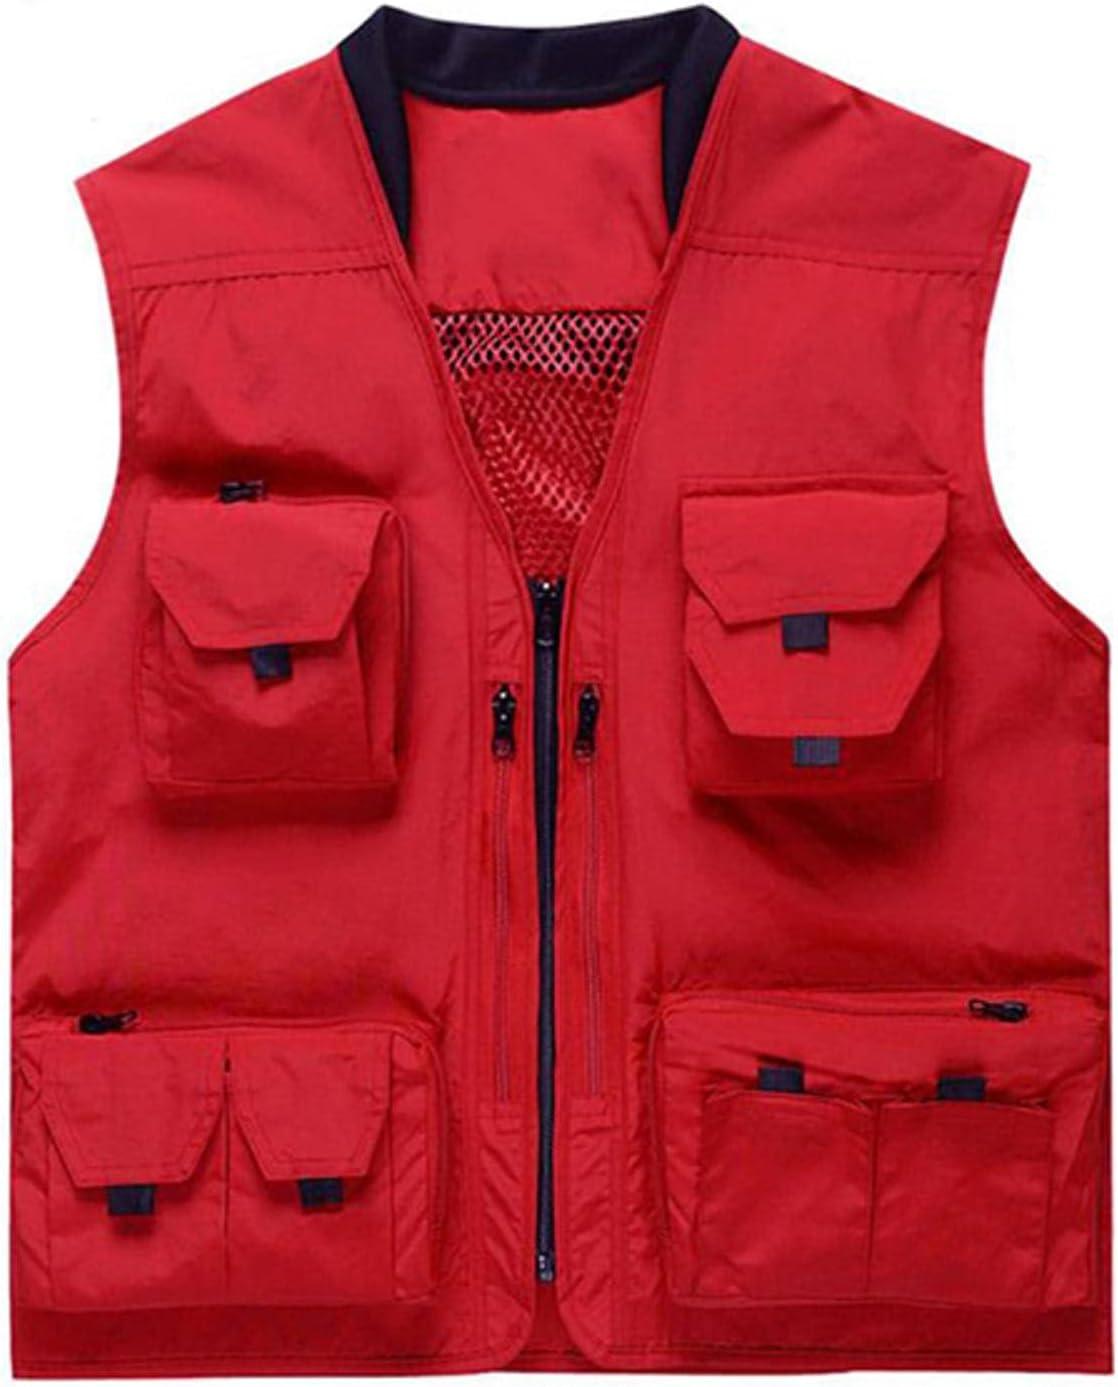 NC Photography Vest Quick-Drying Mesh Fishing Multi-Pocket Vest Detachable Vest with Zipper Vest Outdoor Activities SY015